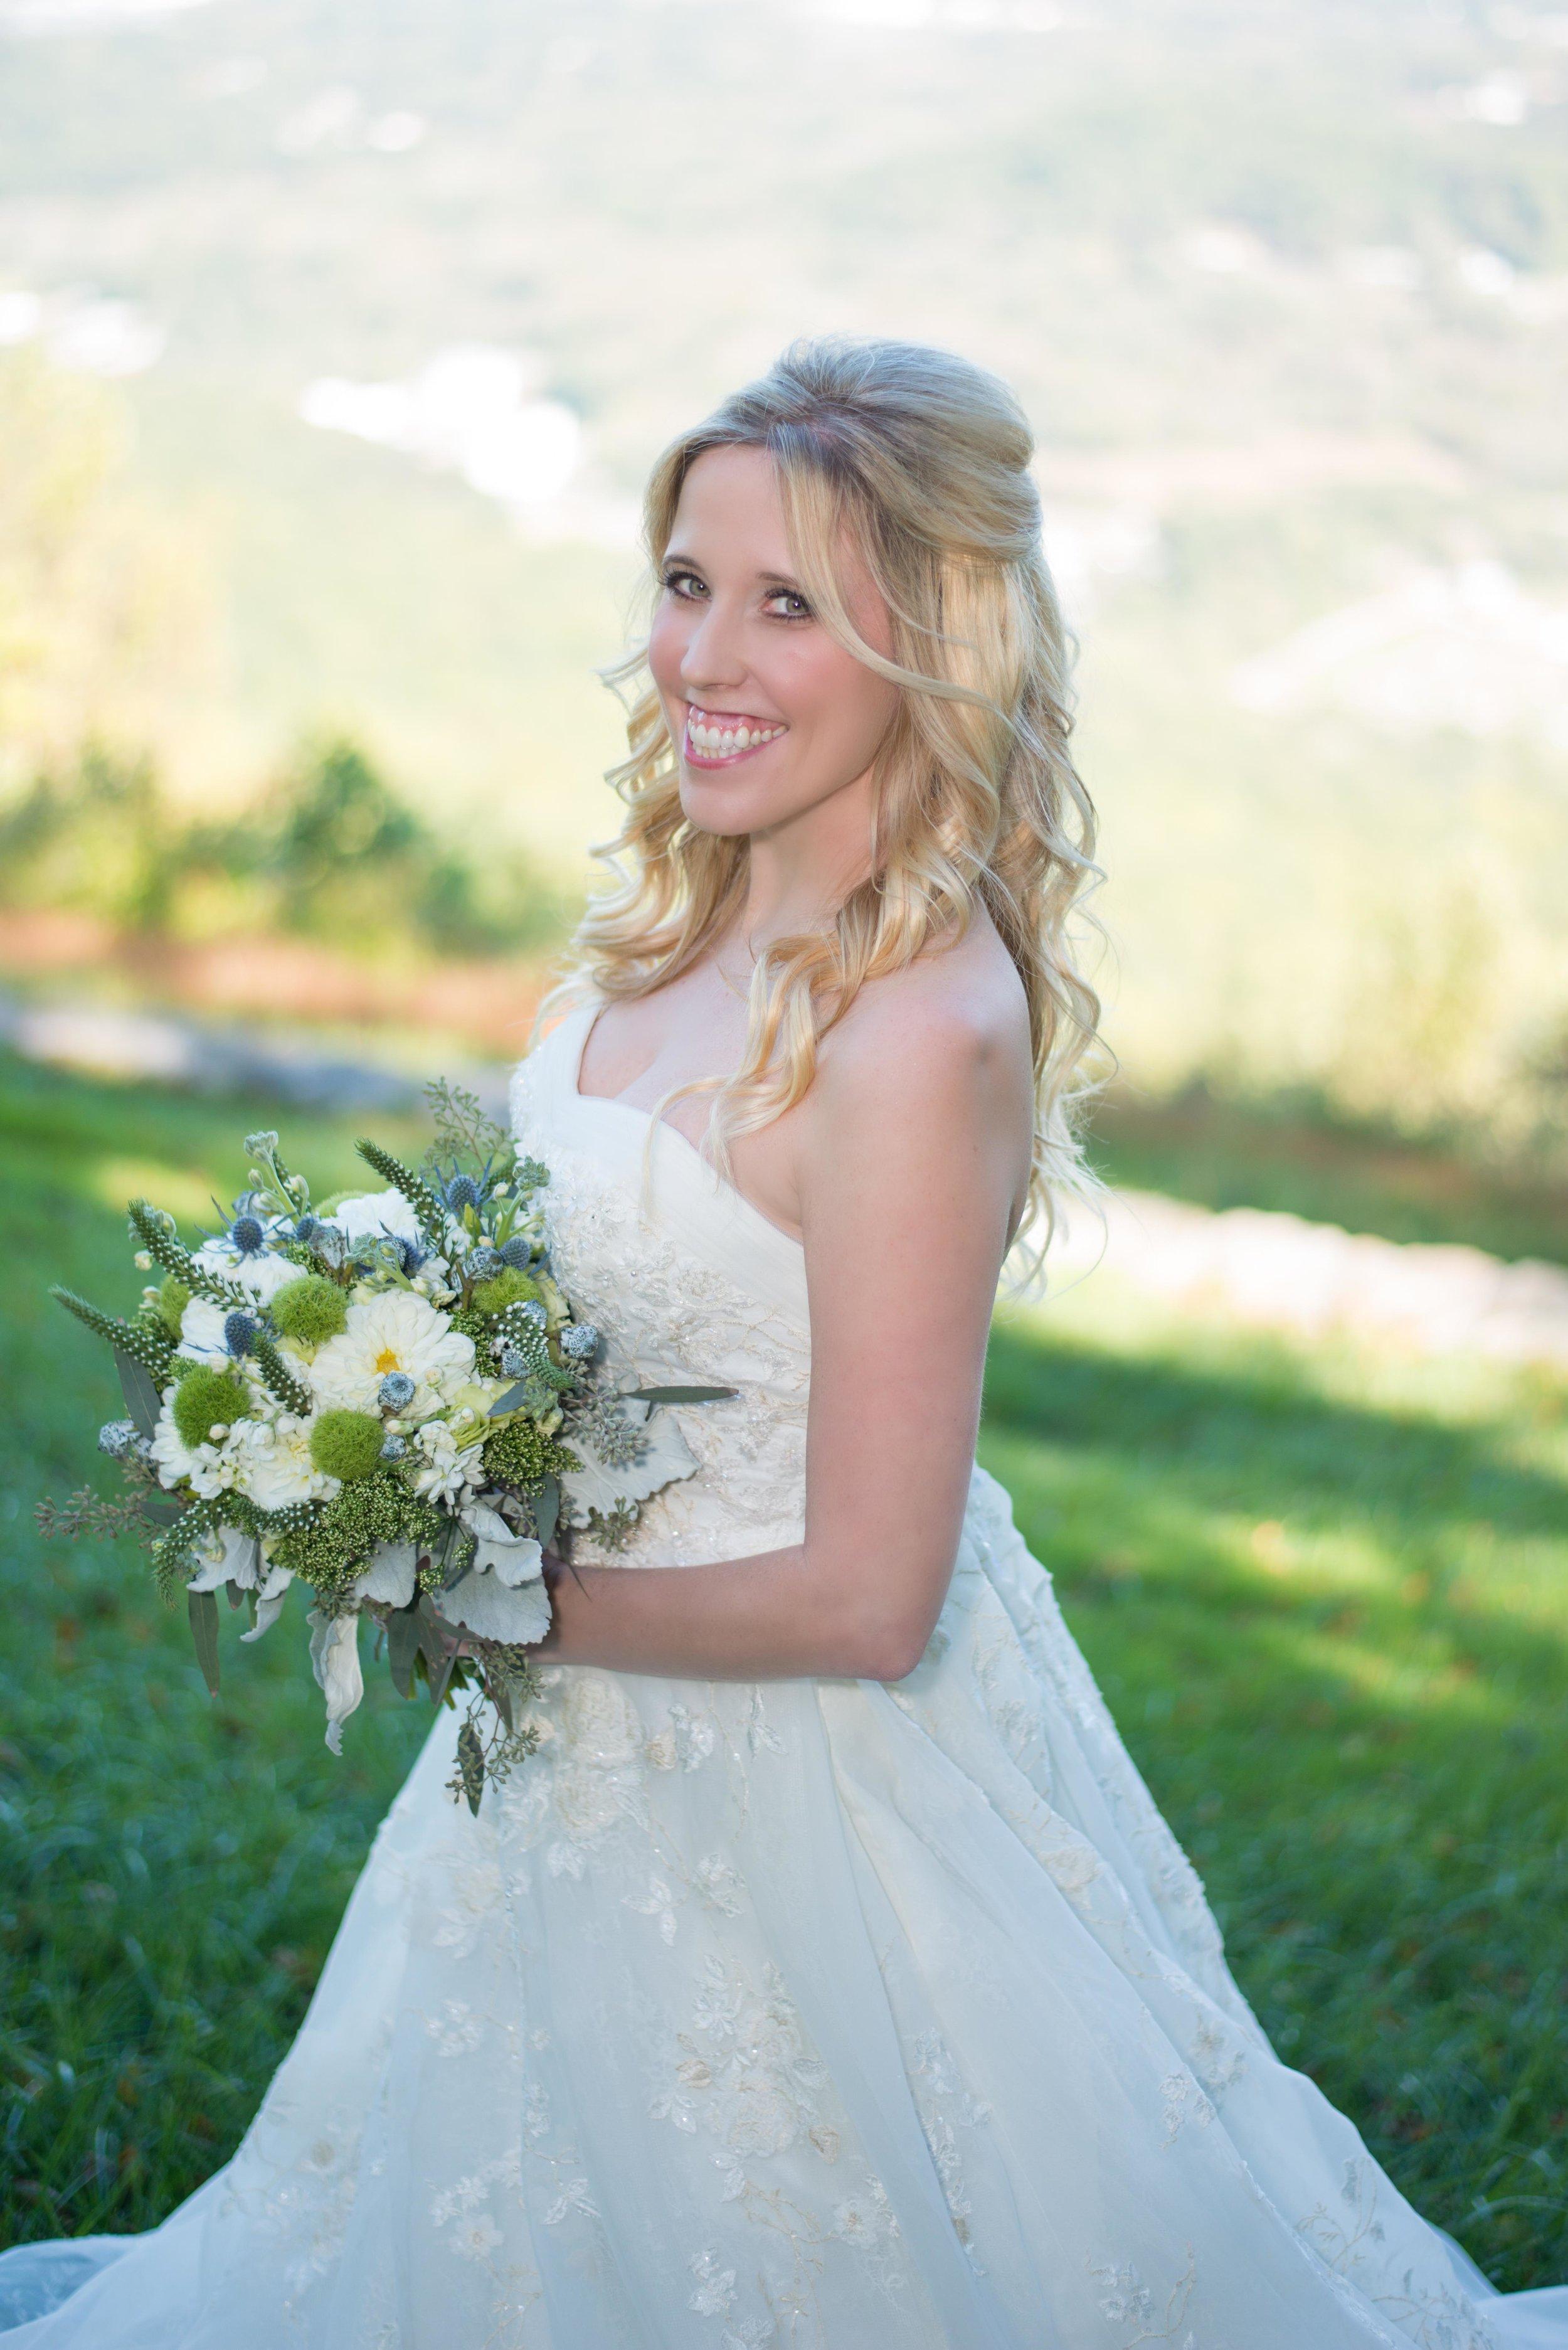 00001_Kuhnert-Wedding-12.jpg